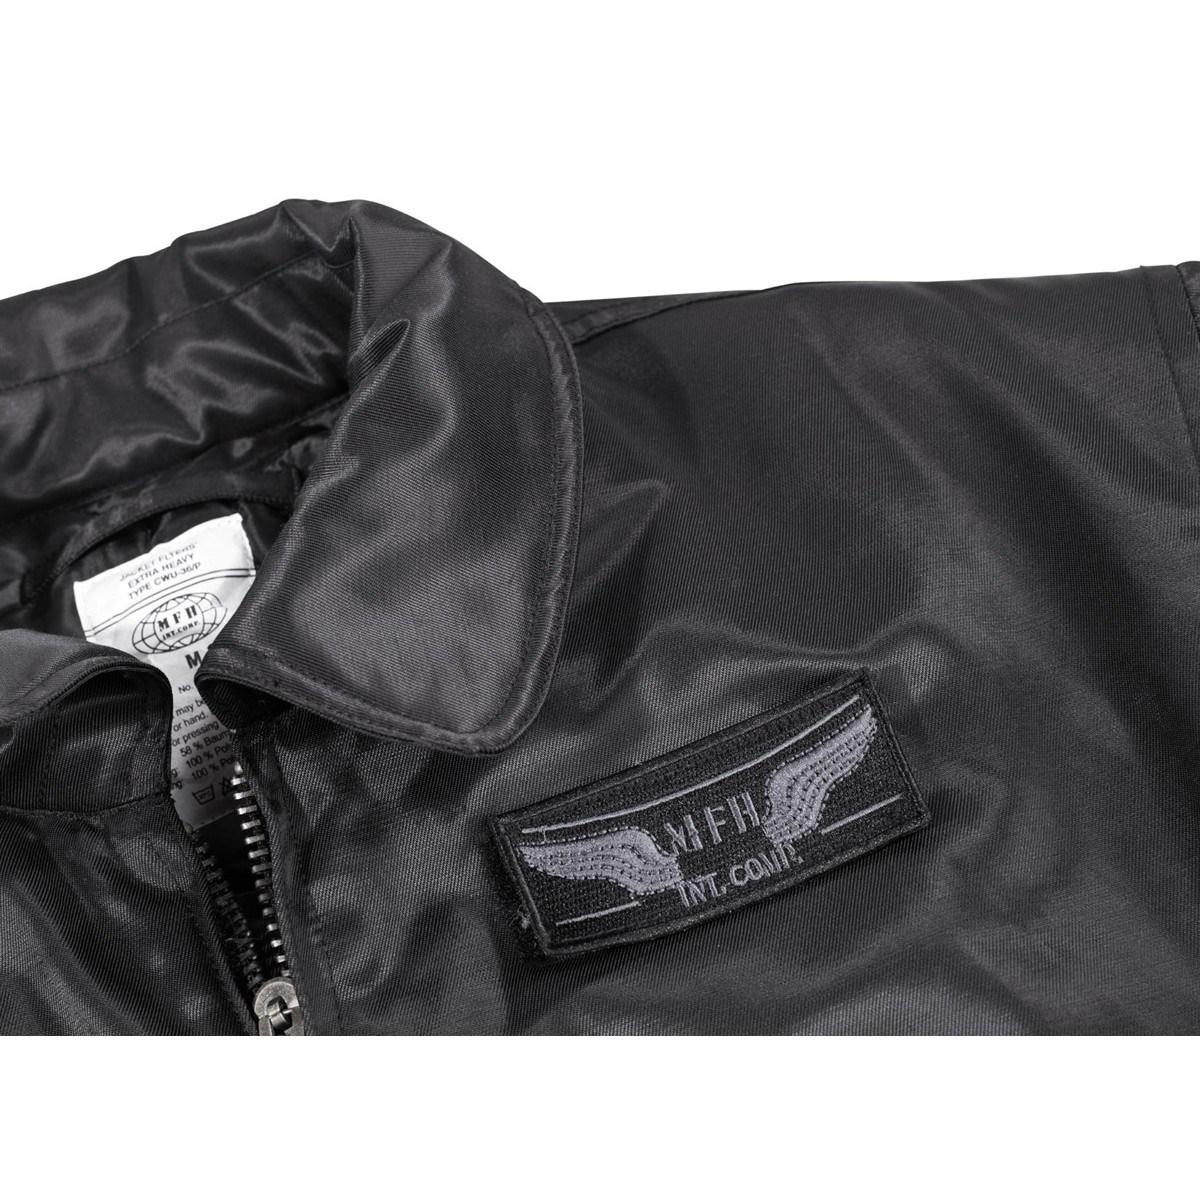 Jacket CWU solid material BLACK MFH int. comp. 03742A L-11